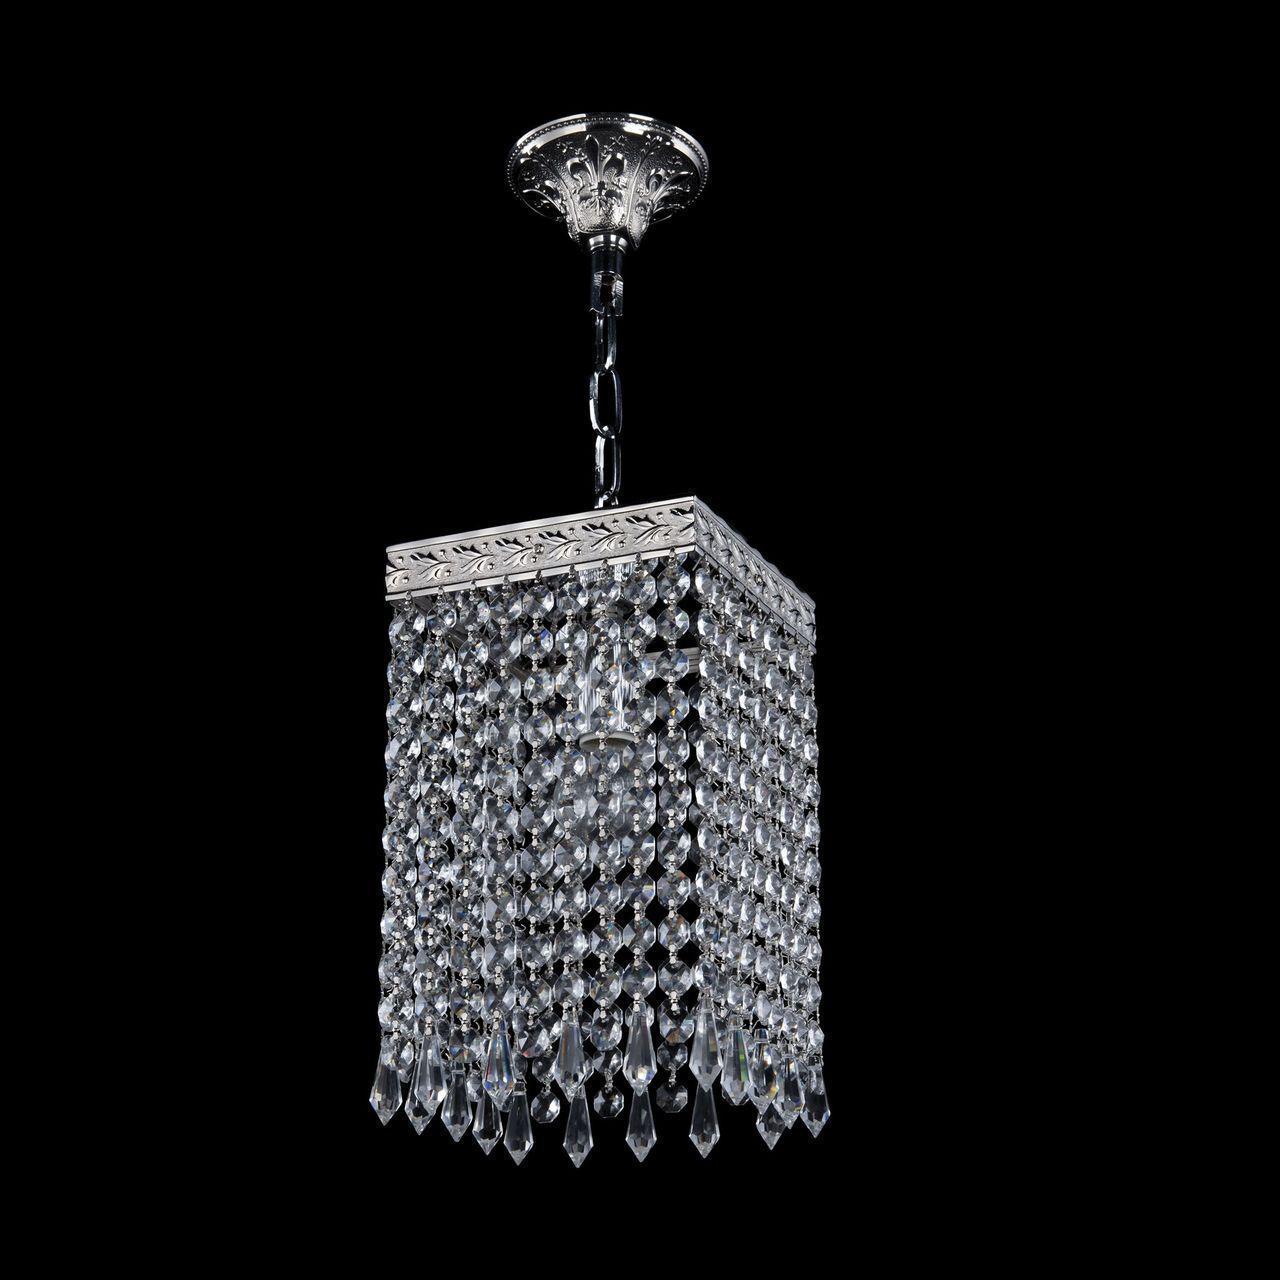 Подвесной светильник Bohemia Ivele 19202/15IV Ni Drops